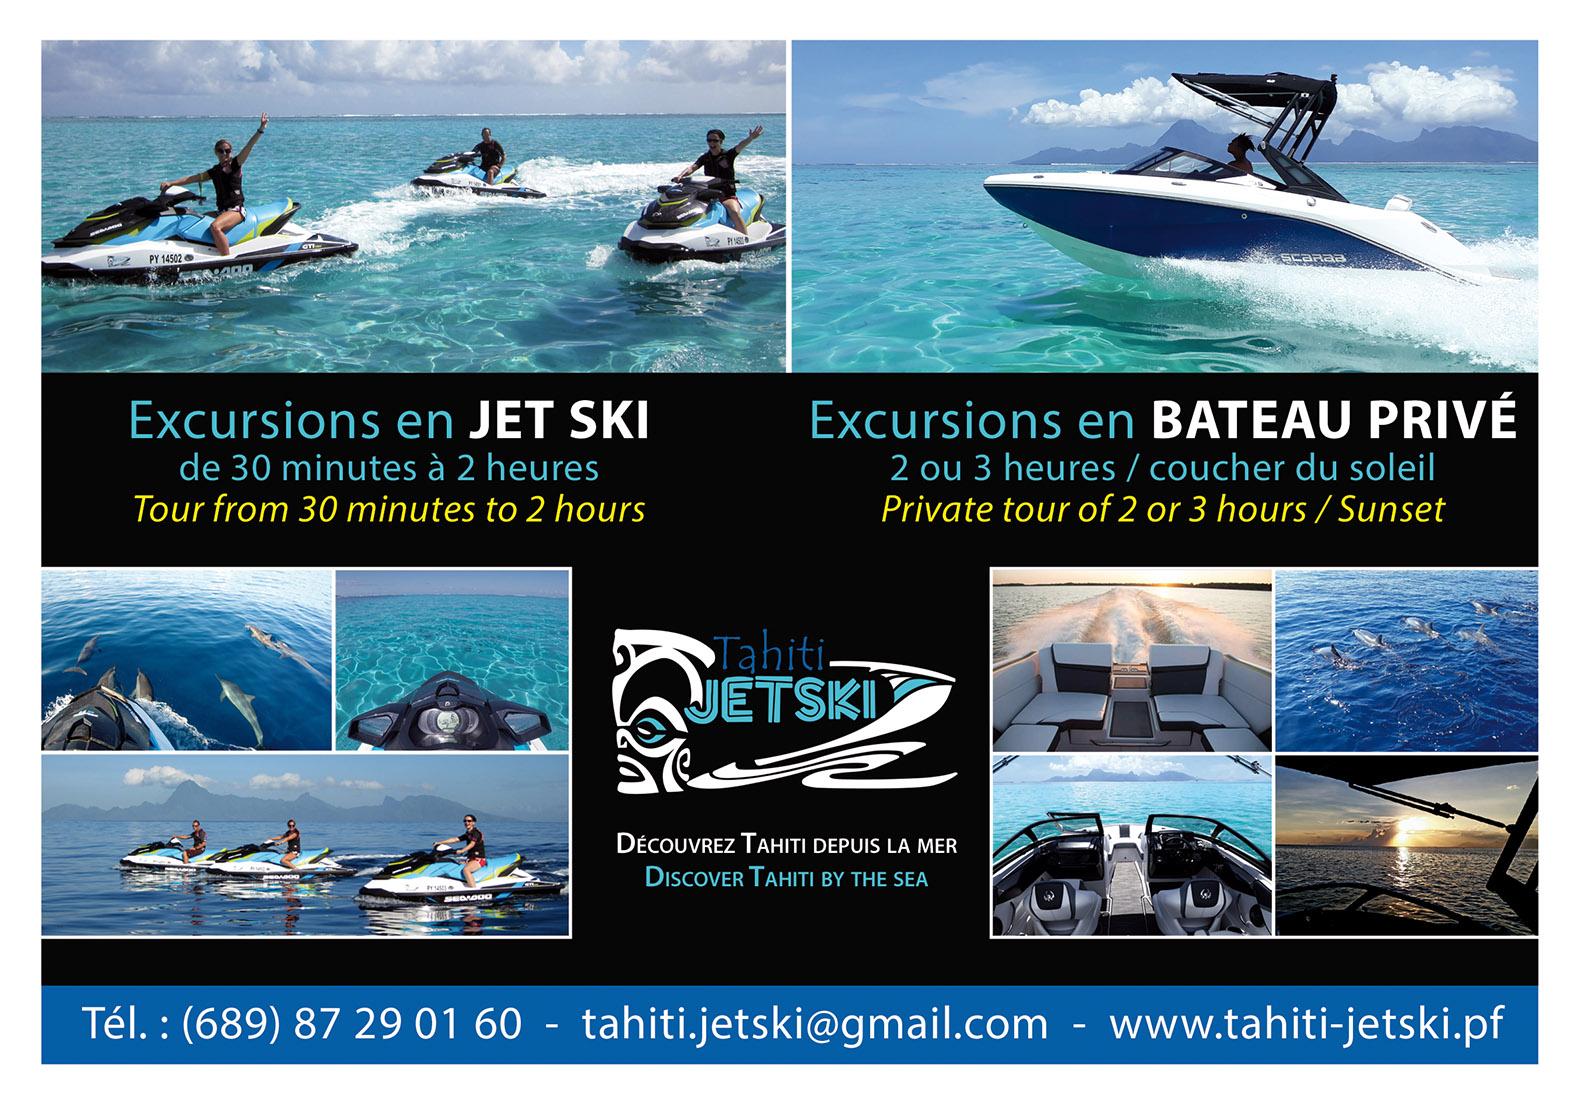 https://tahititourisme.nz/wp-content/uploads/2017/08/Tahiti-Jet-Ski-190x130-sept-2.jpg